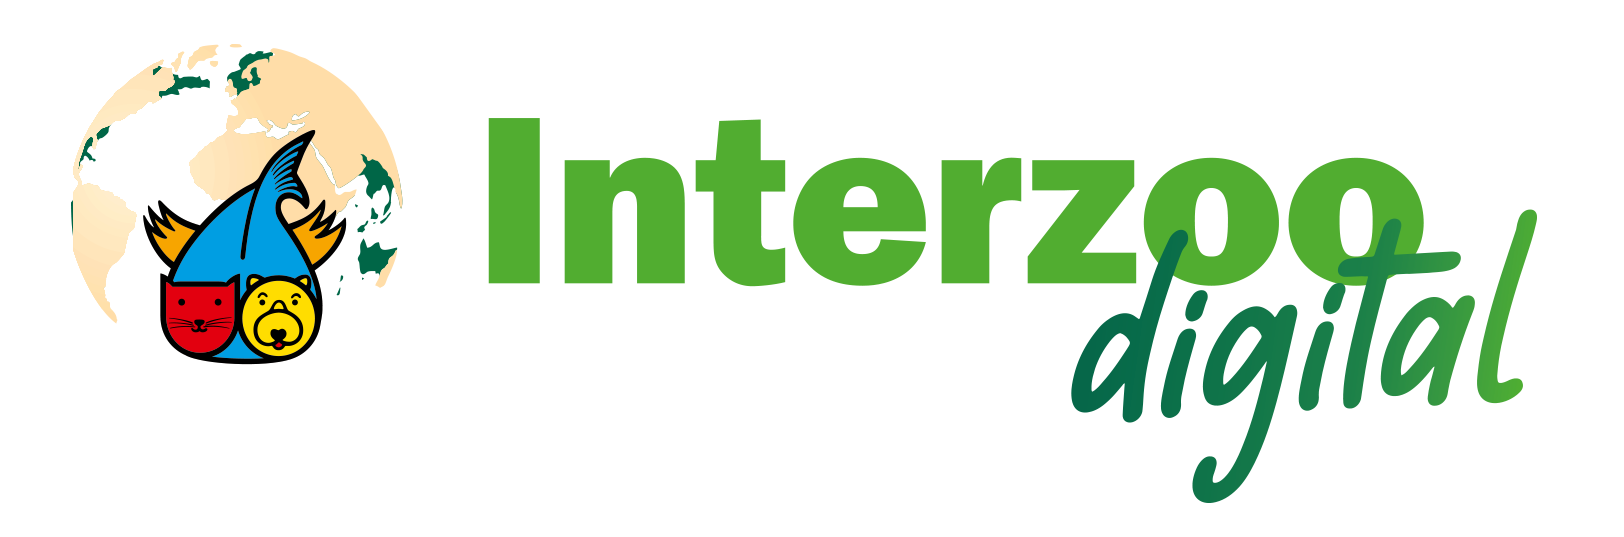 Interzoo-digital-Logo-rgb